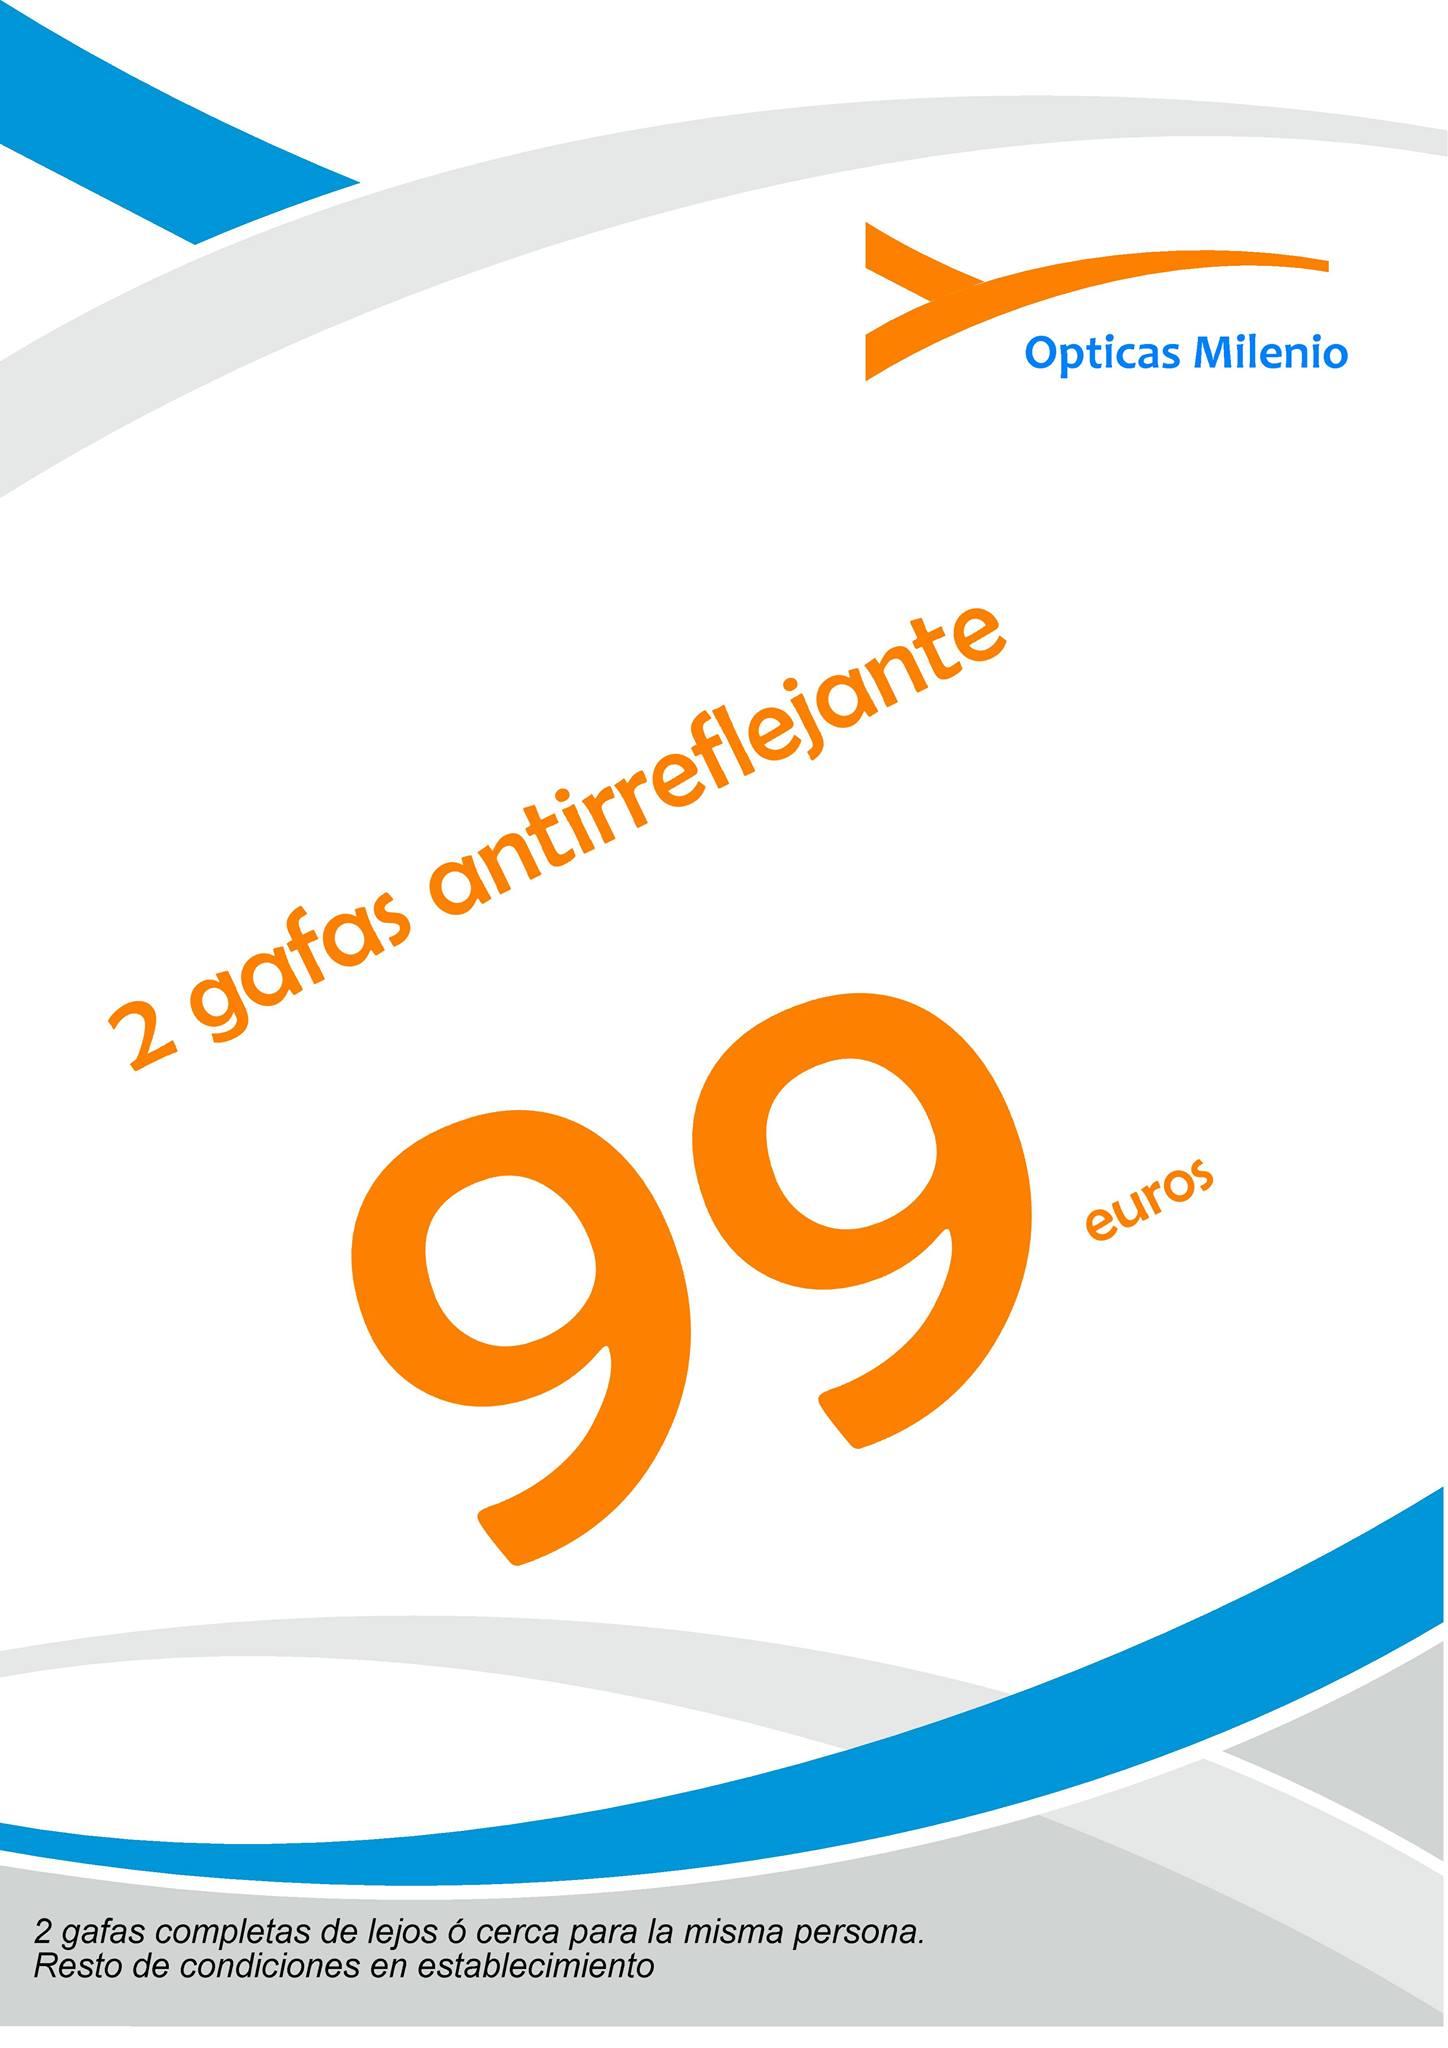 ÓPTICAS MILENIO